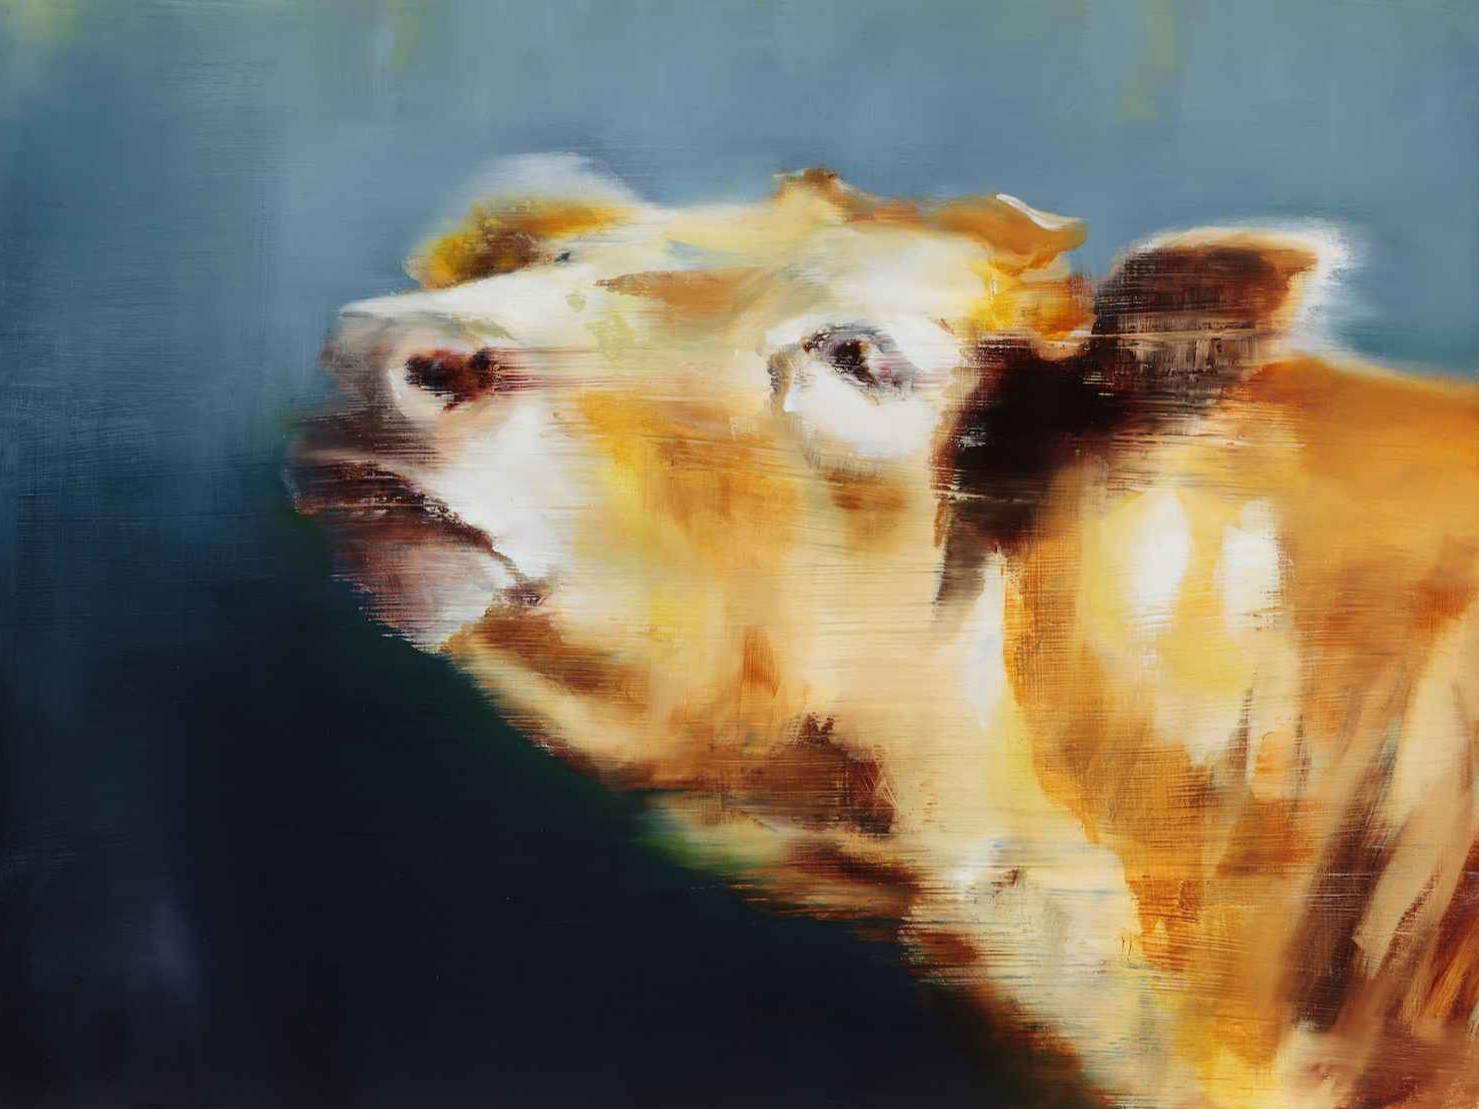 Elsa Sroka. Cow Art. Sorrel Sky Gallery. Santa Fe Art Gallery. Maura Allen. Edward Aldrich. Kevin Red Star. Ray Hare. Durango Art Gallery.